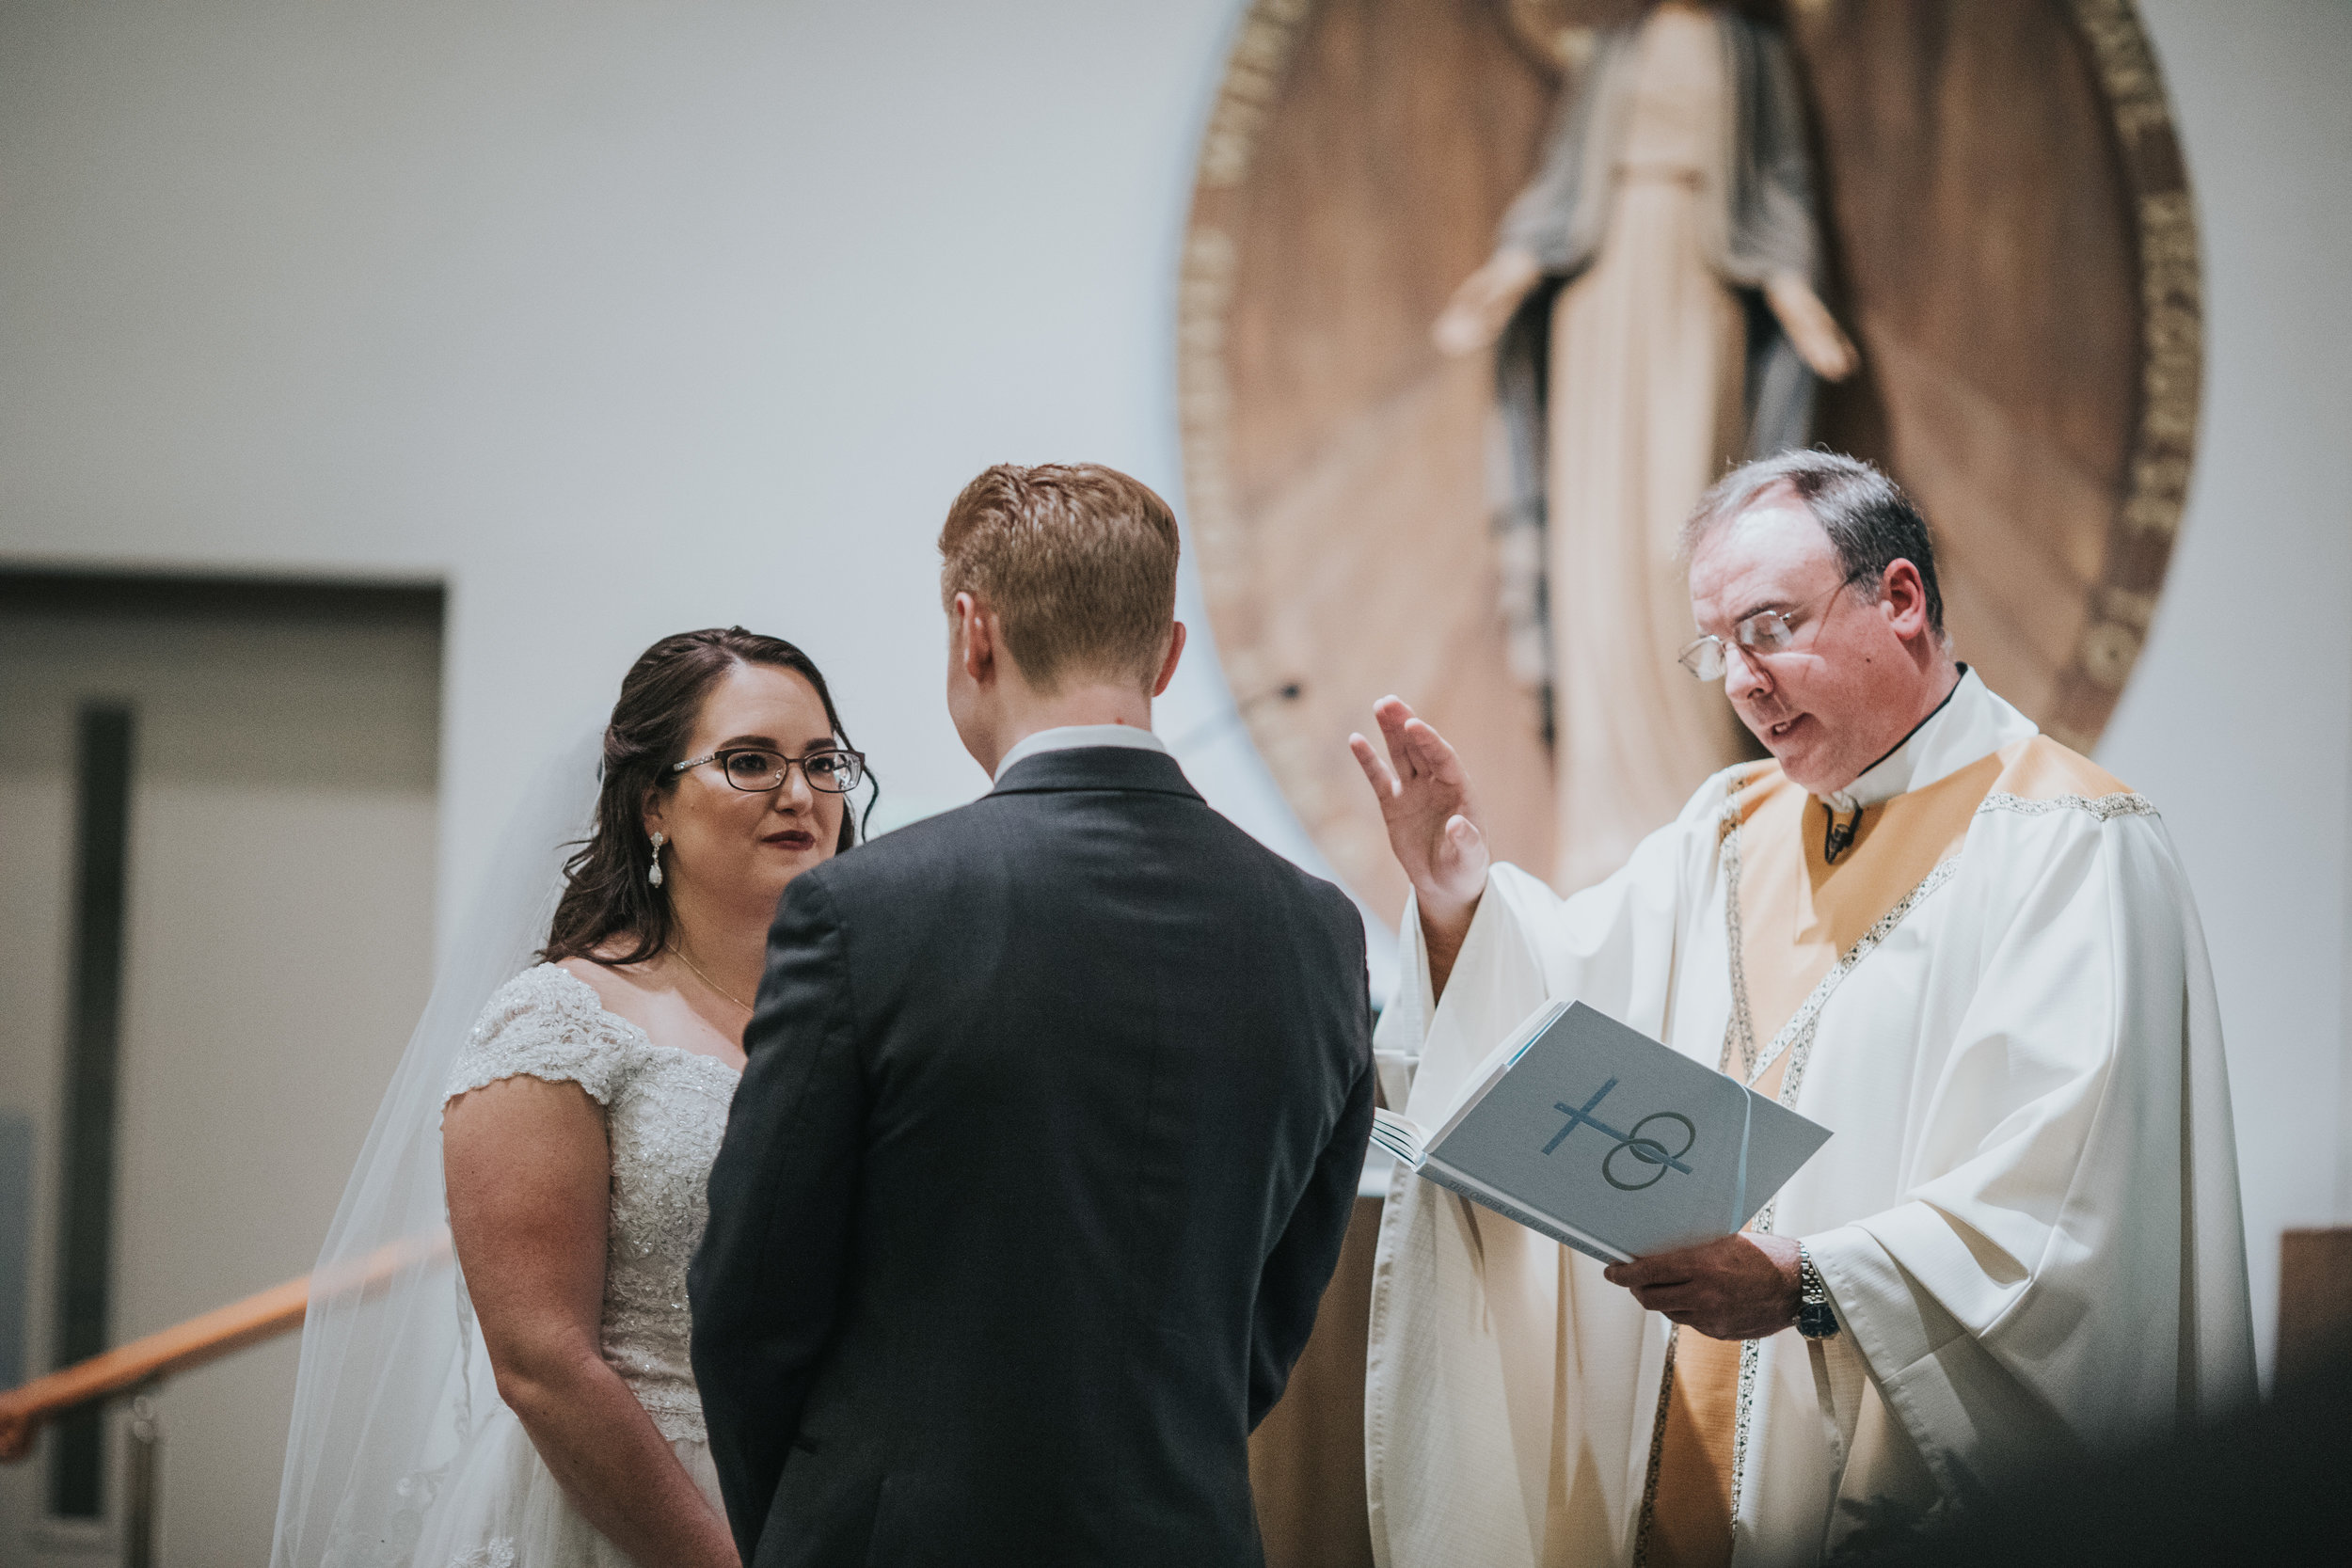 New-Jersey-Wedding-Photography-Fishers-Tudor-House-JennaLynnPhotography-Ceremony-Kathleen&Eddie-99.jpg